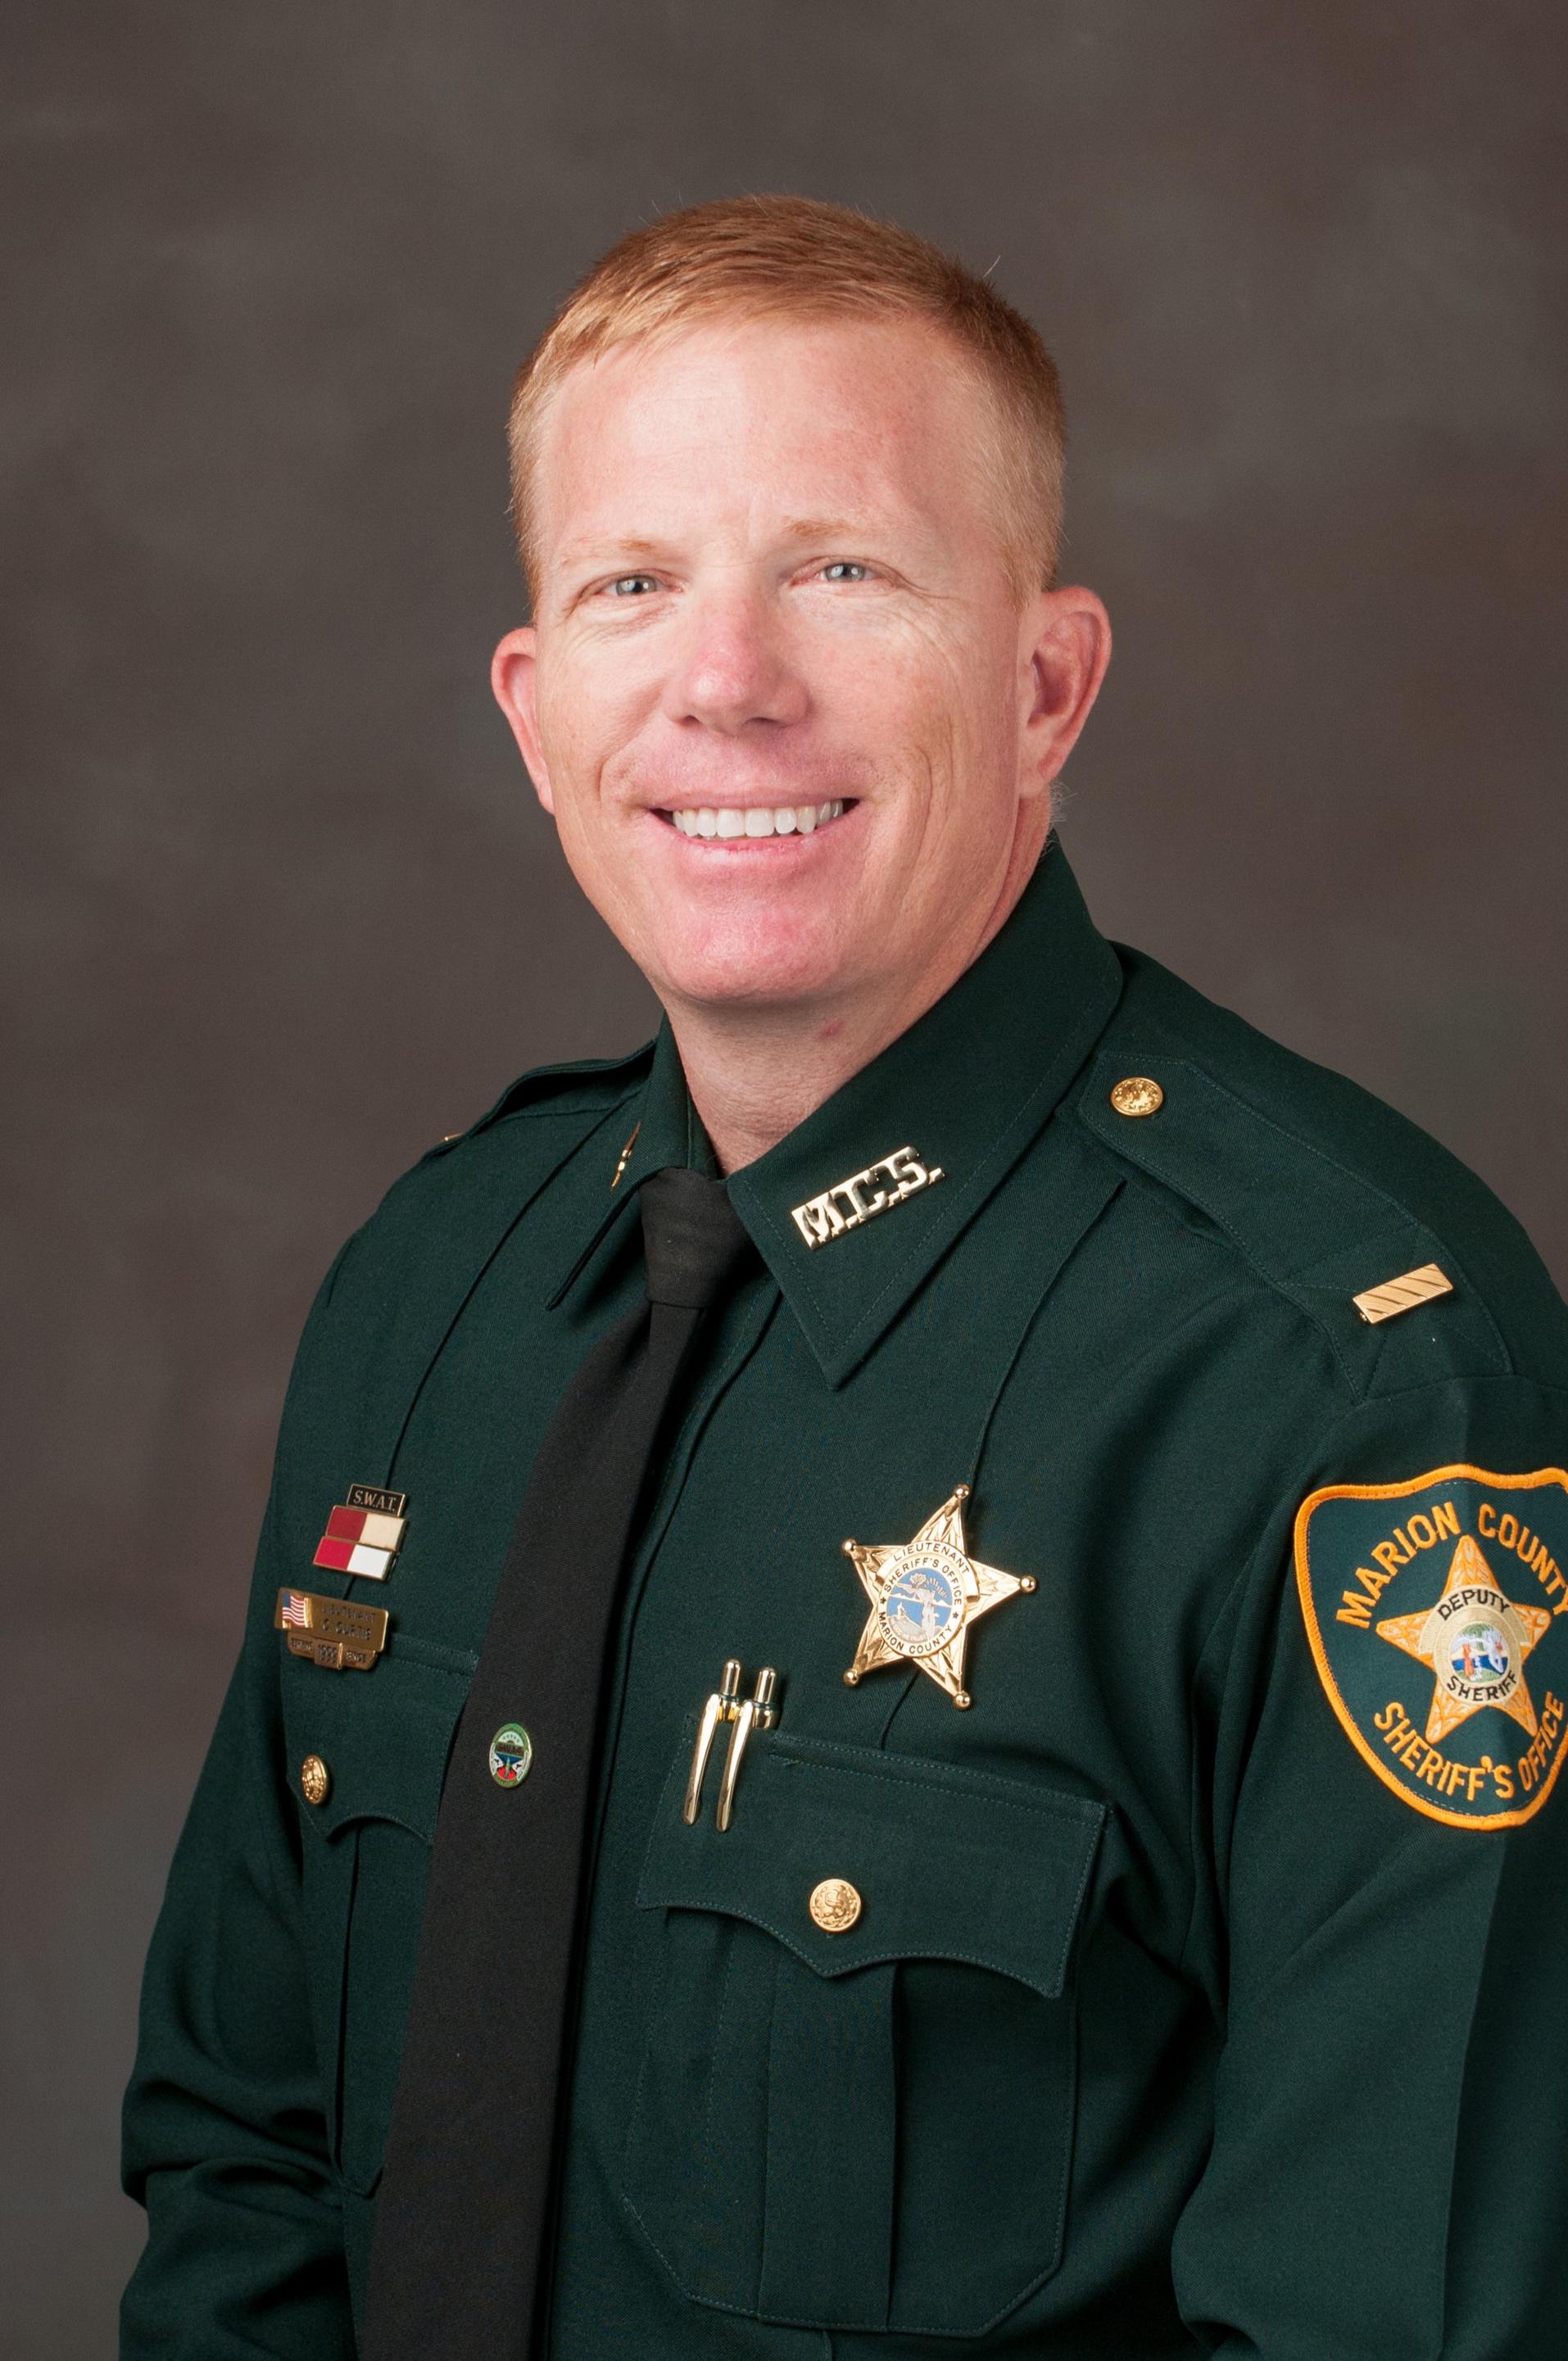 Lieutenant Carlton Curtis   North-Central District Commander   ccurtis@marionso.com